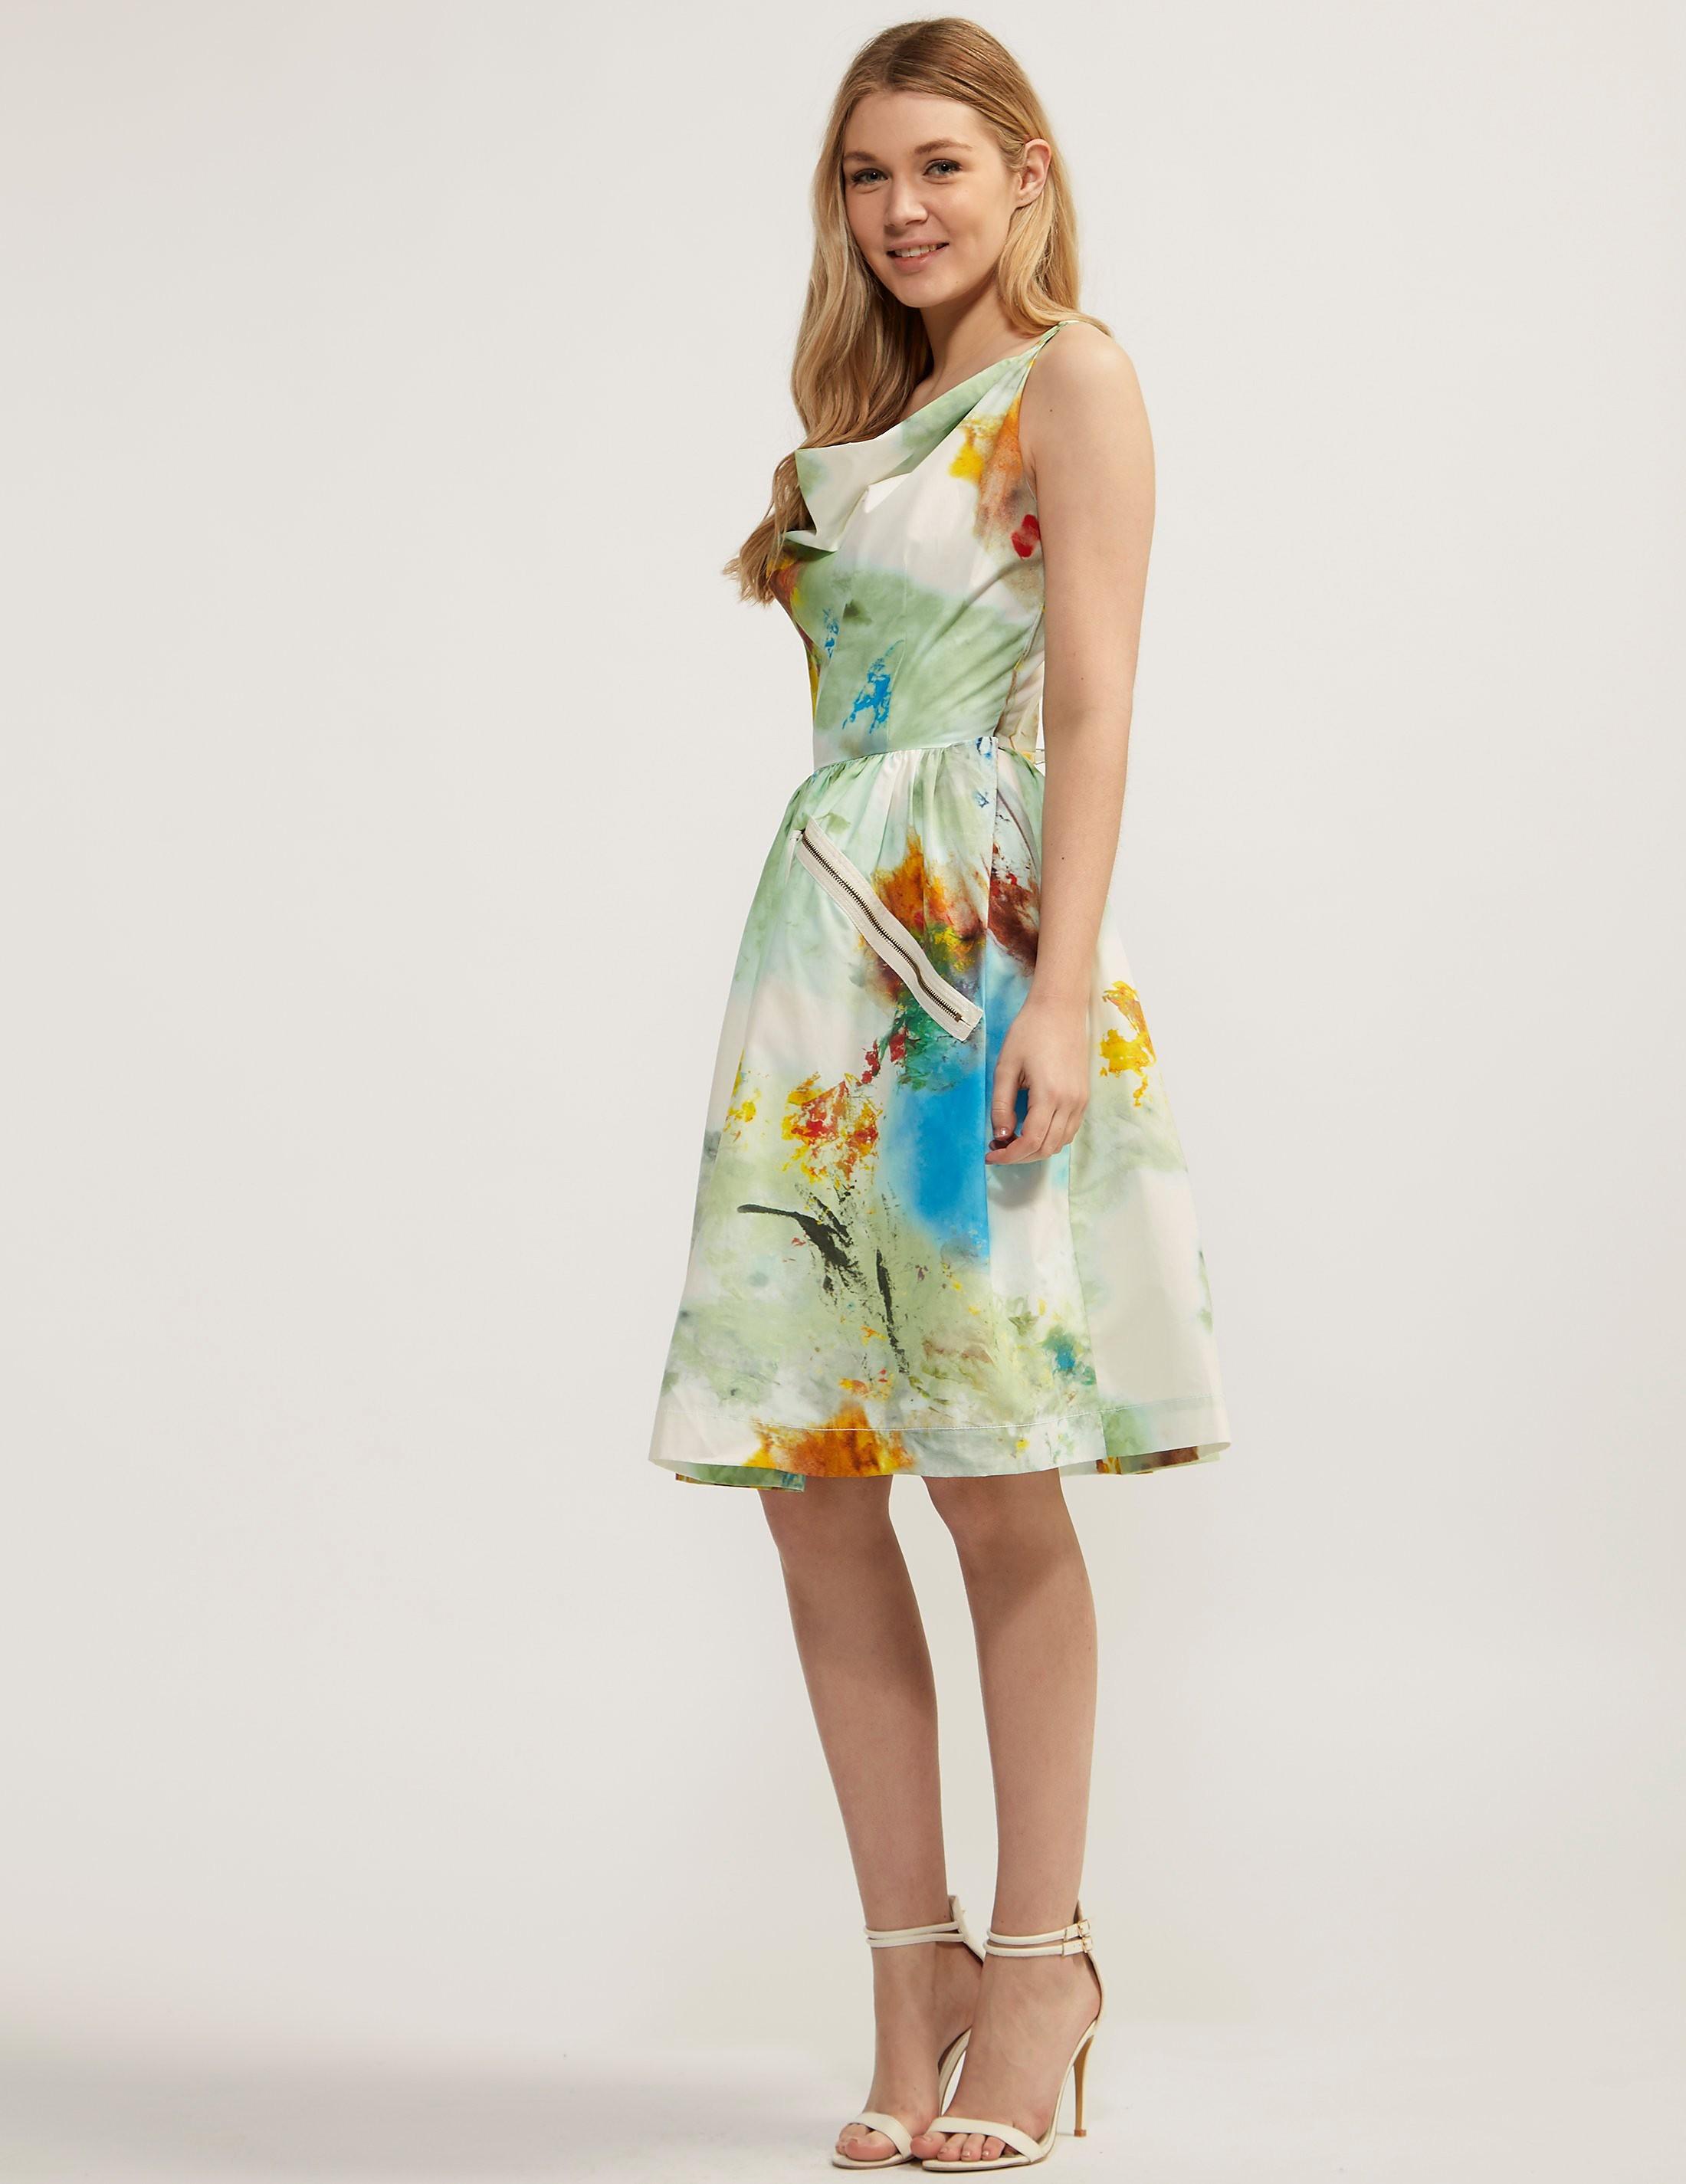 Vivienne Westwood Punk Monroe Dress